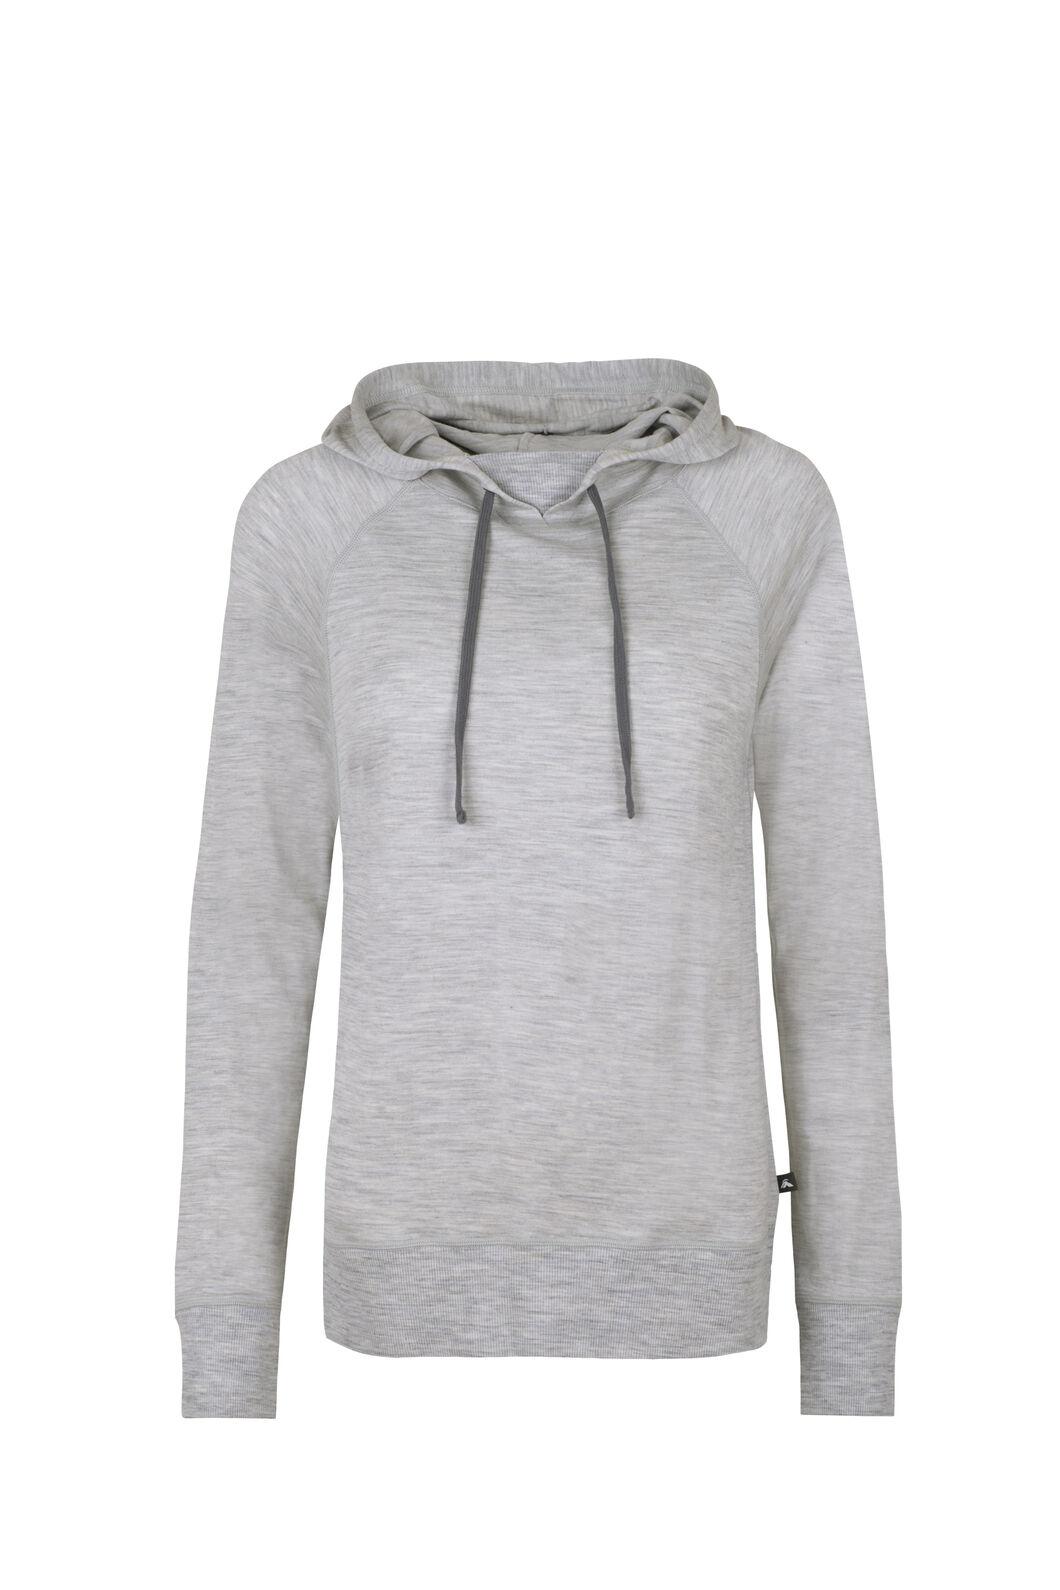 Macpac Skyline Pullover Hoody - Women's, Light Grey Marle, hi-res